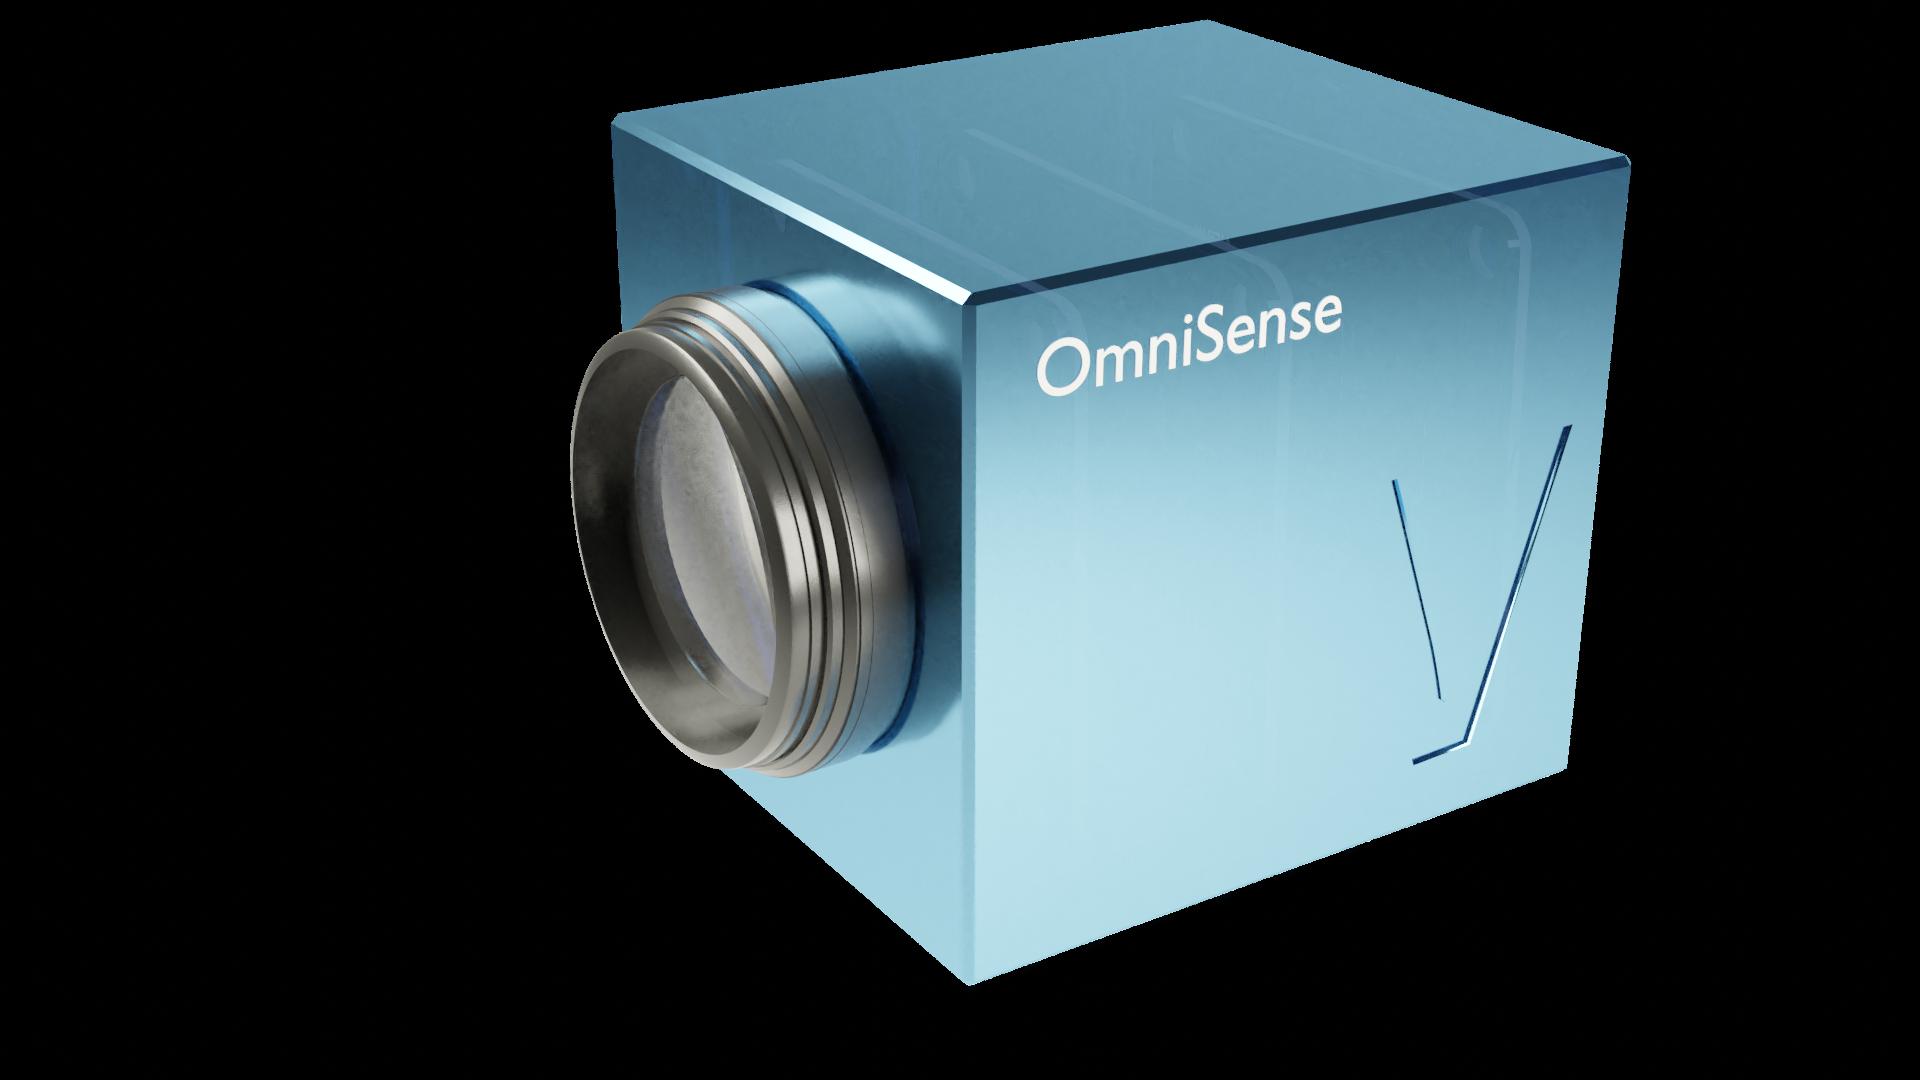 omnisense render picture